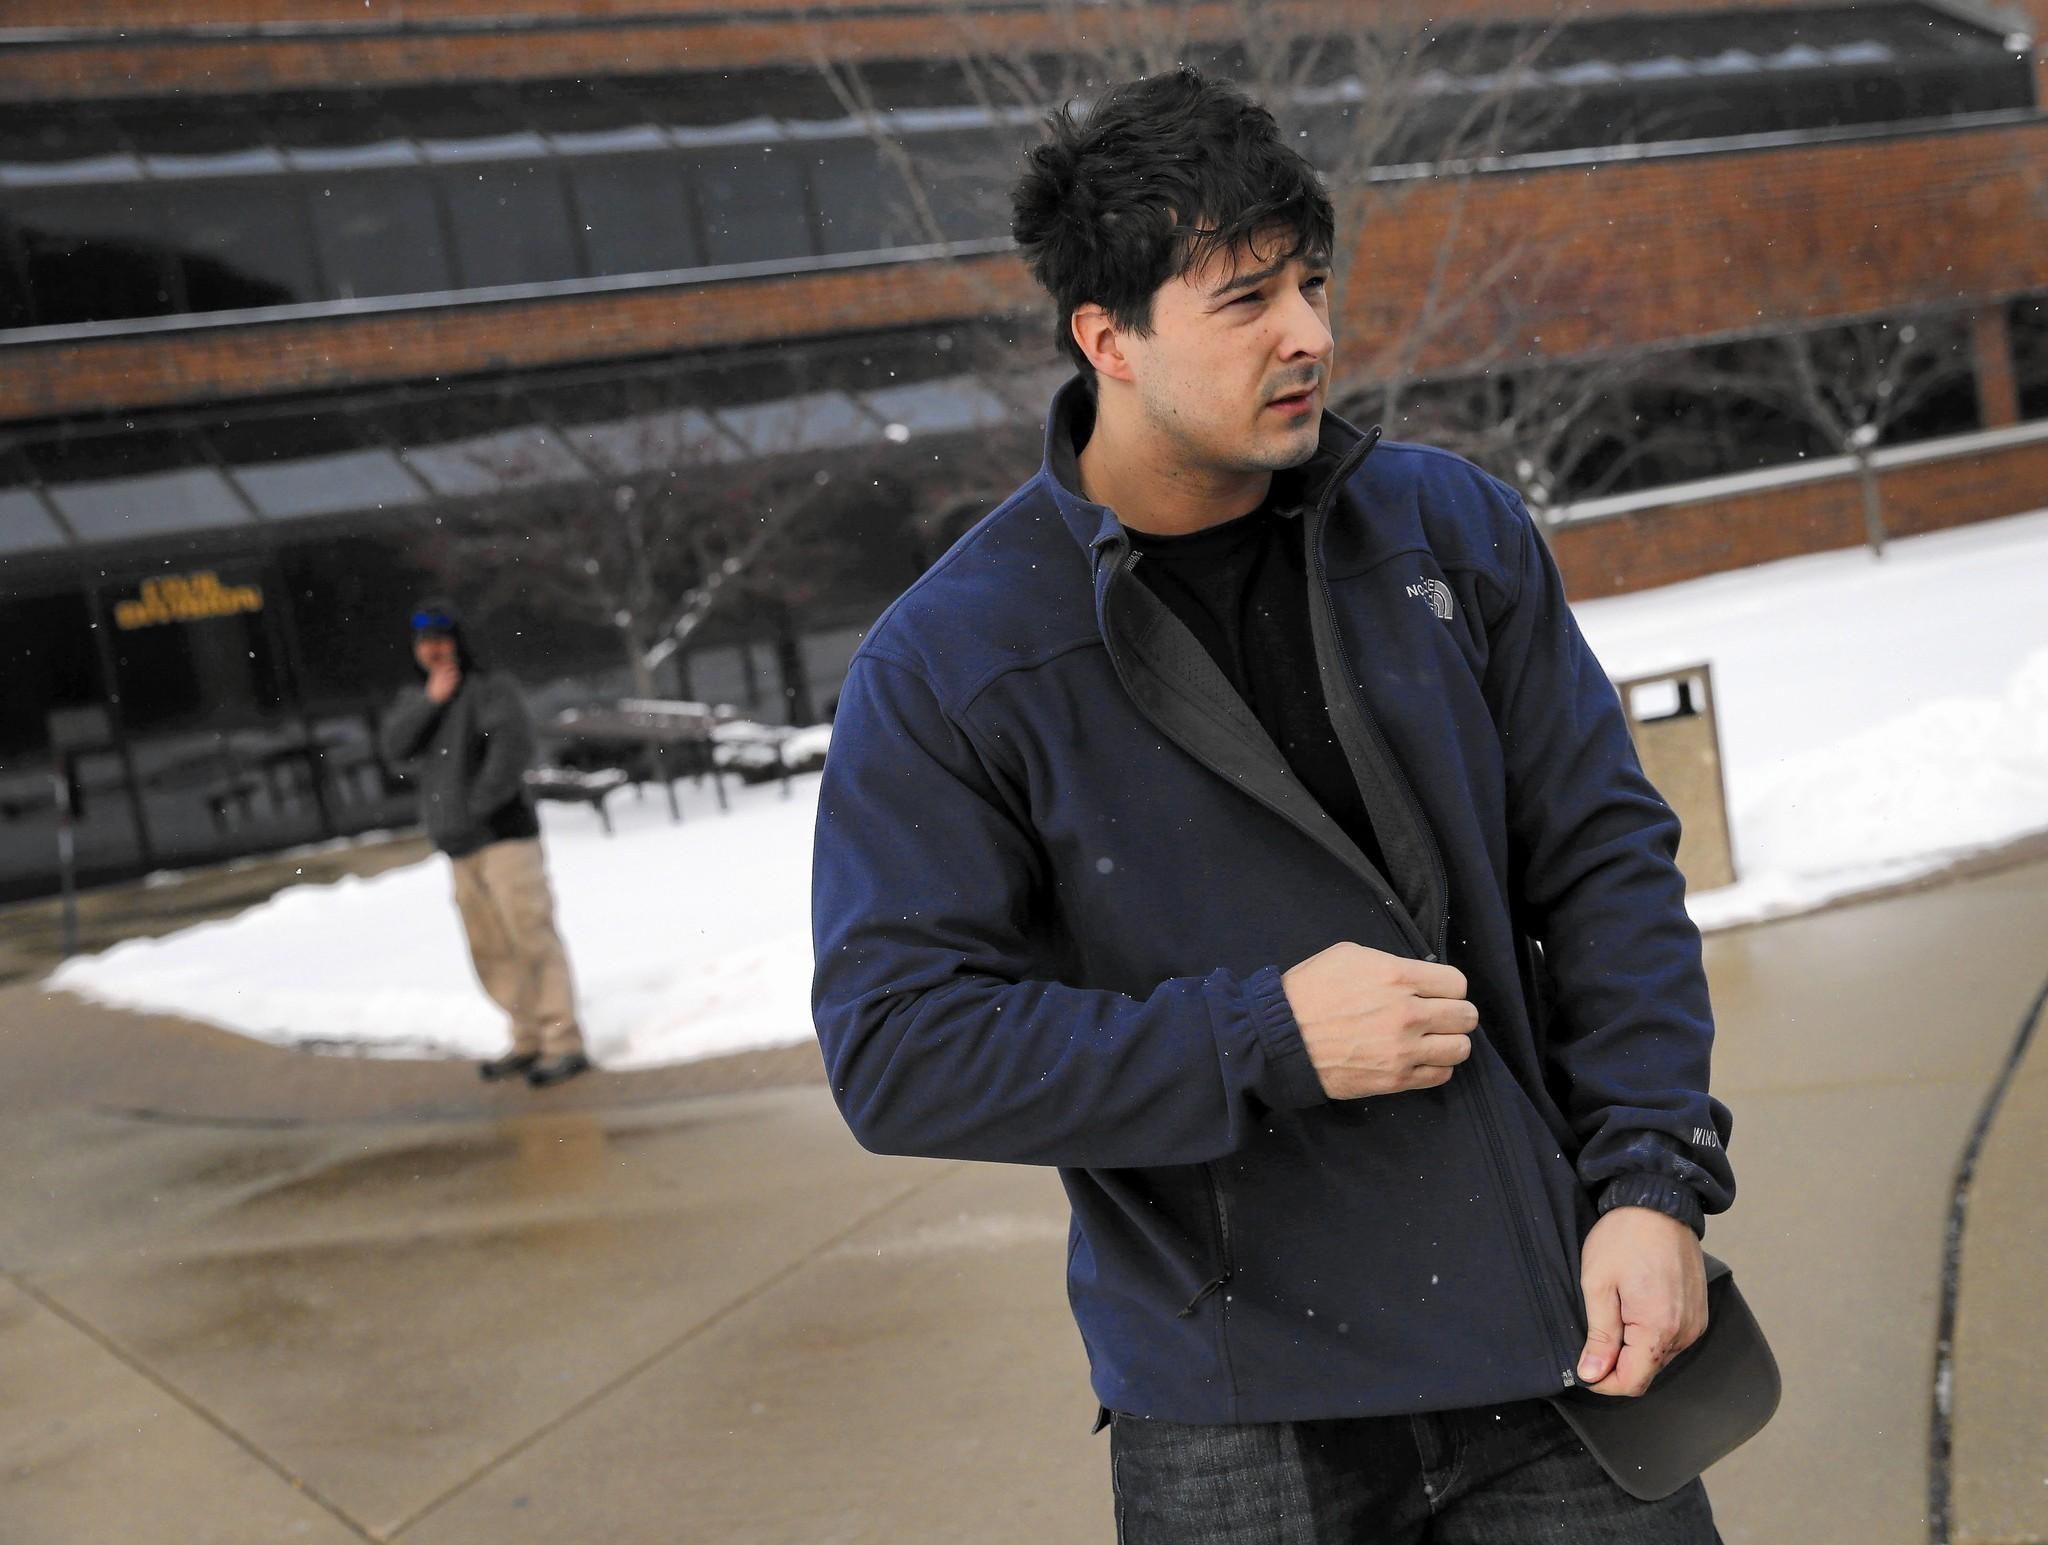 Sąd uniewinnił policjanta z Schaumburga oskarżonego o handel narkotykami